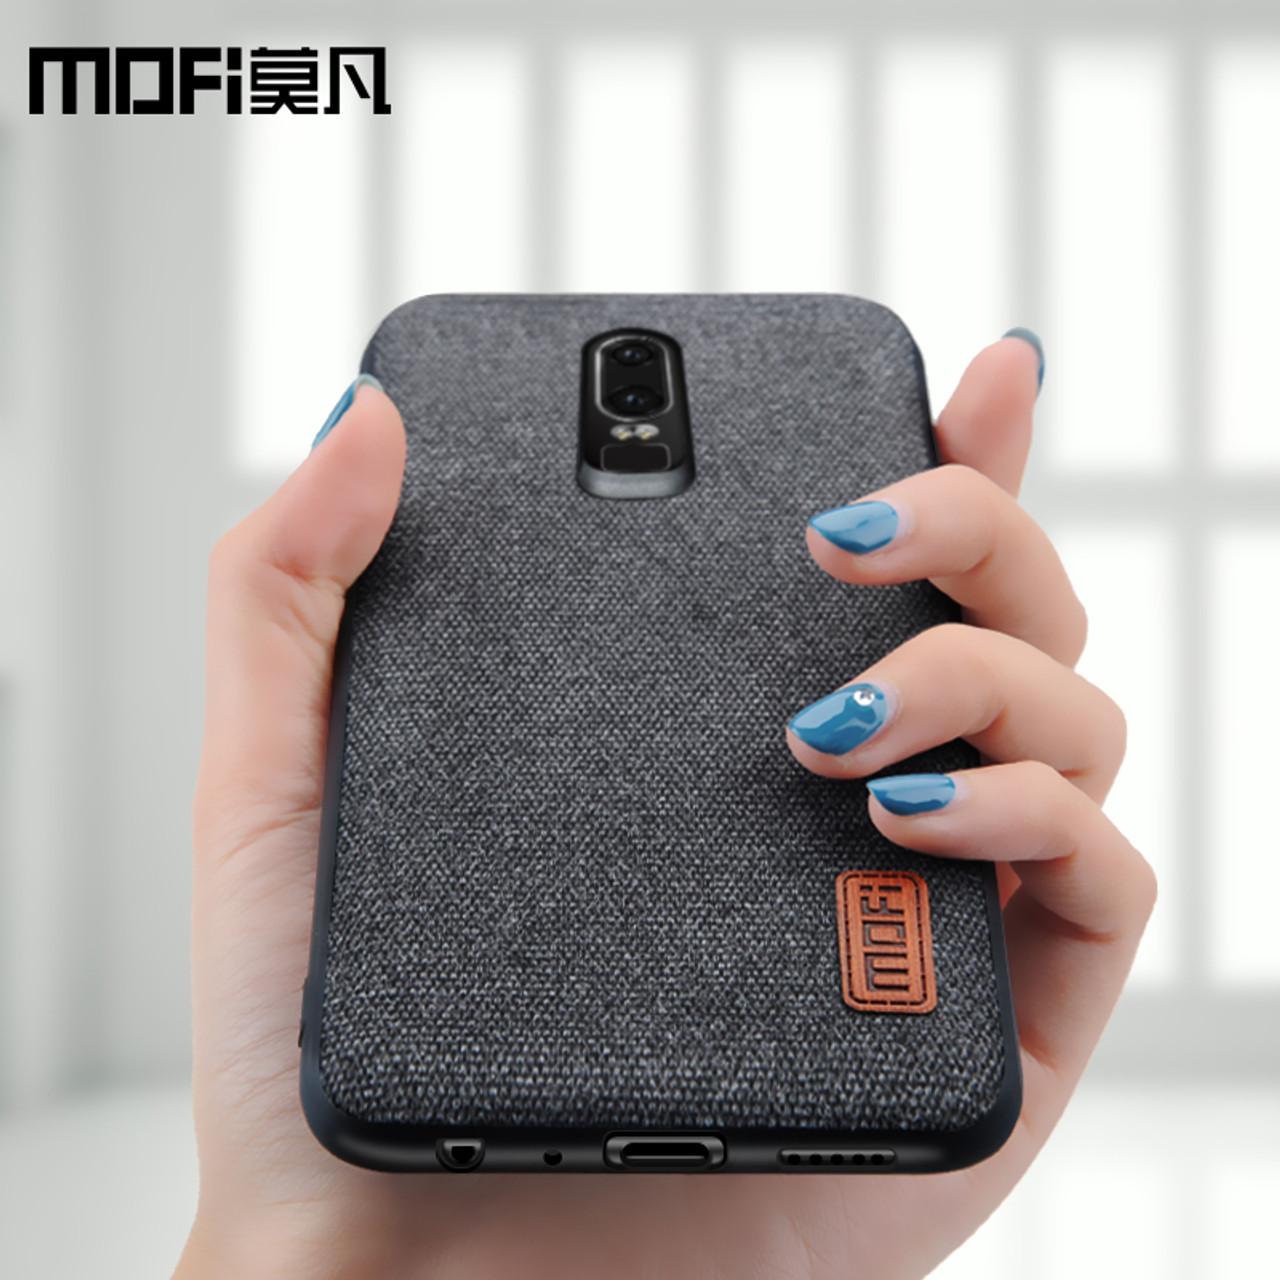 quality design 4a016 c2637 one plus 6 case oneplus 6 back cover hard protective business style case  coque capas MOFi original 1+6 oneplus 6 case